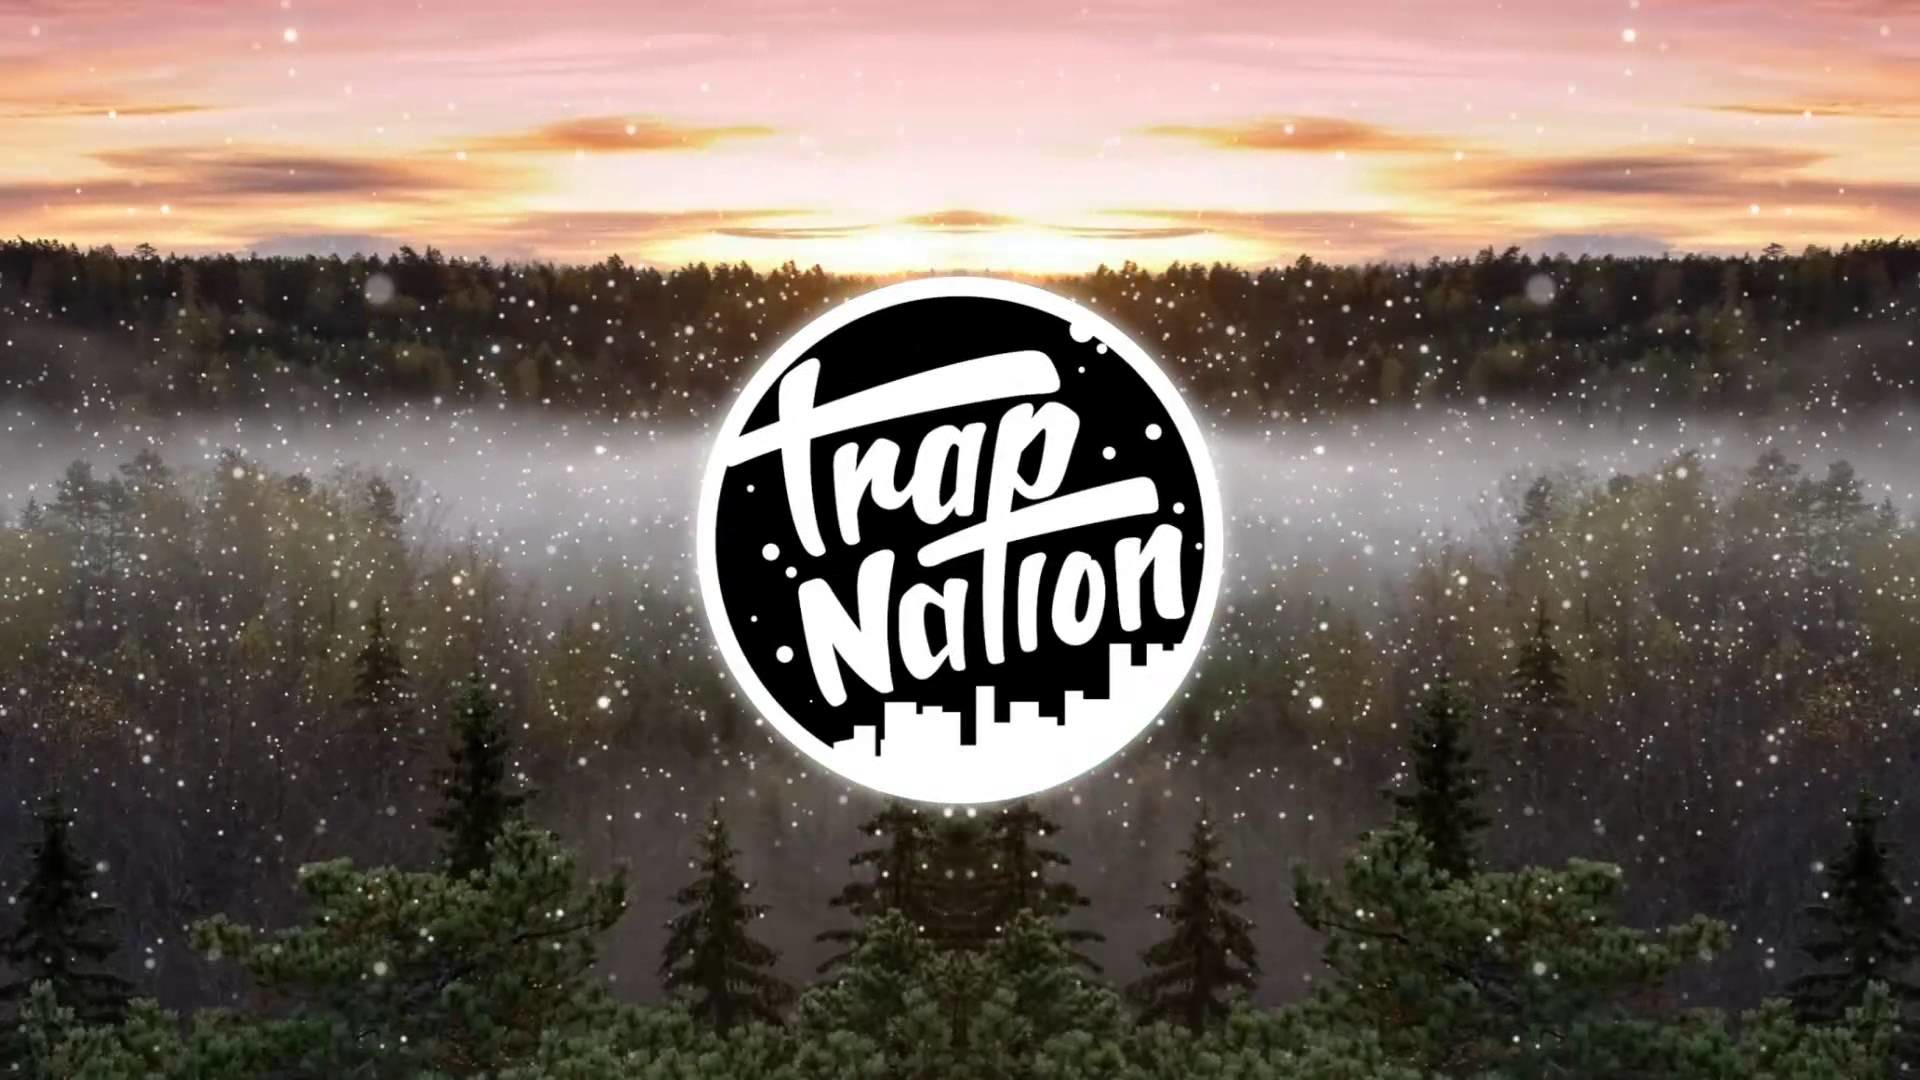 Trap Nation Wallpapers Source Downloa Trapnation 4K Hd Desktop Michaelieclark